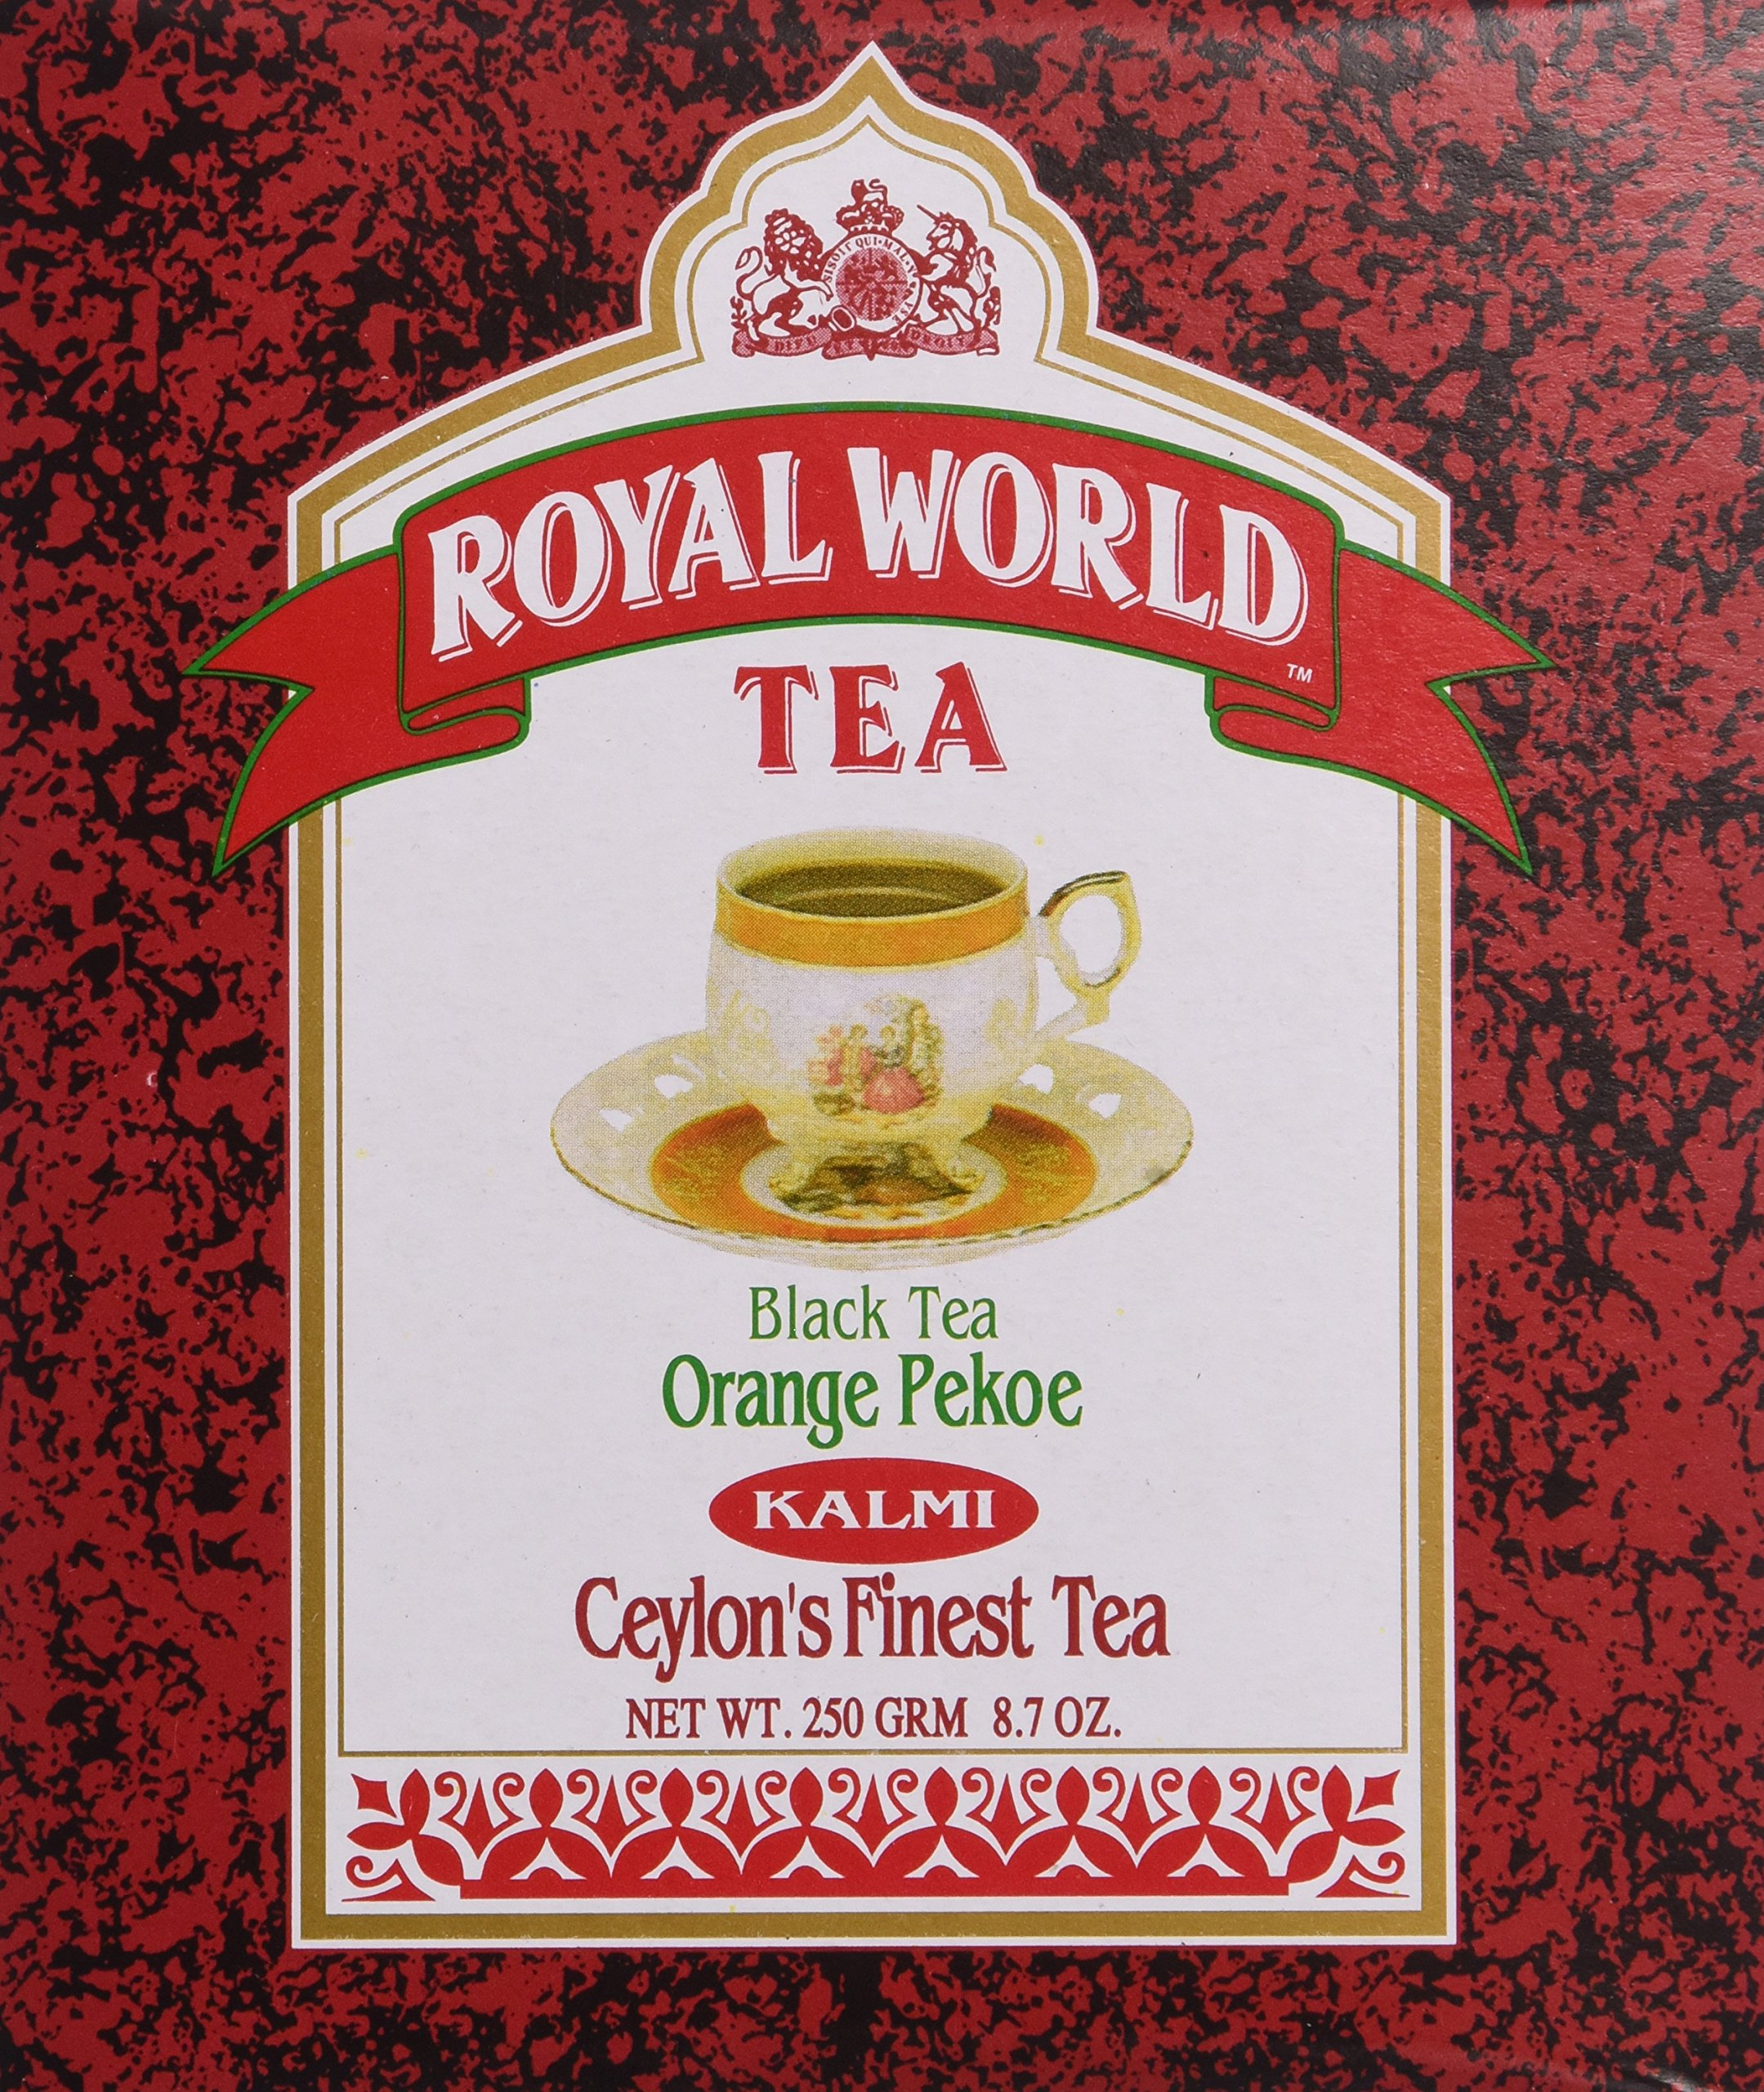 Royal World Orange Pekoe Kalmi Black Tea, 250 Gram (Pack of 24)